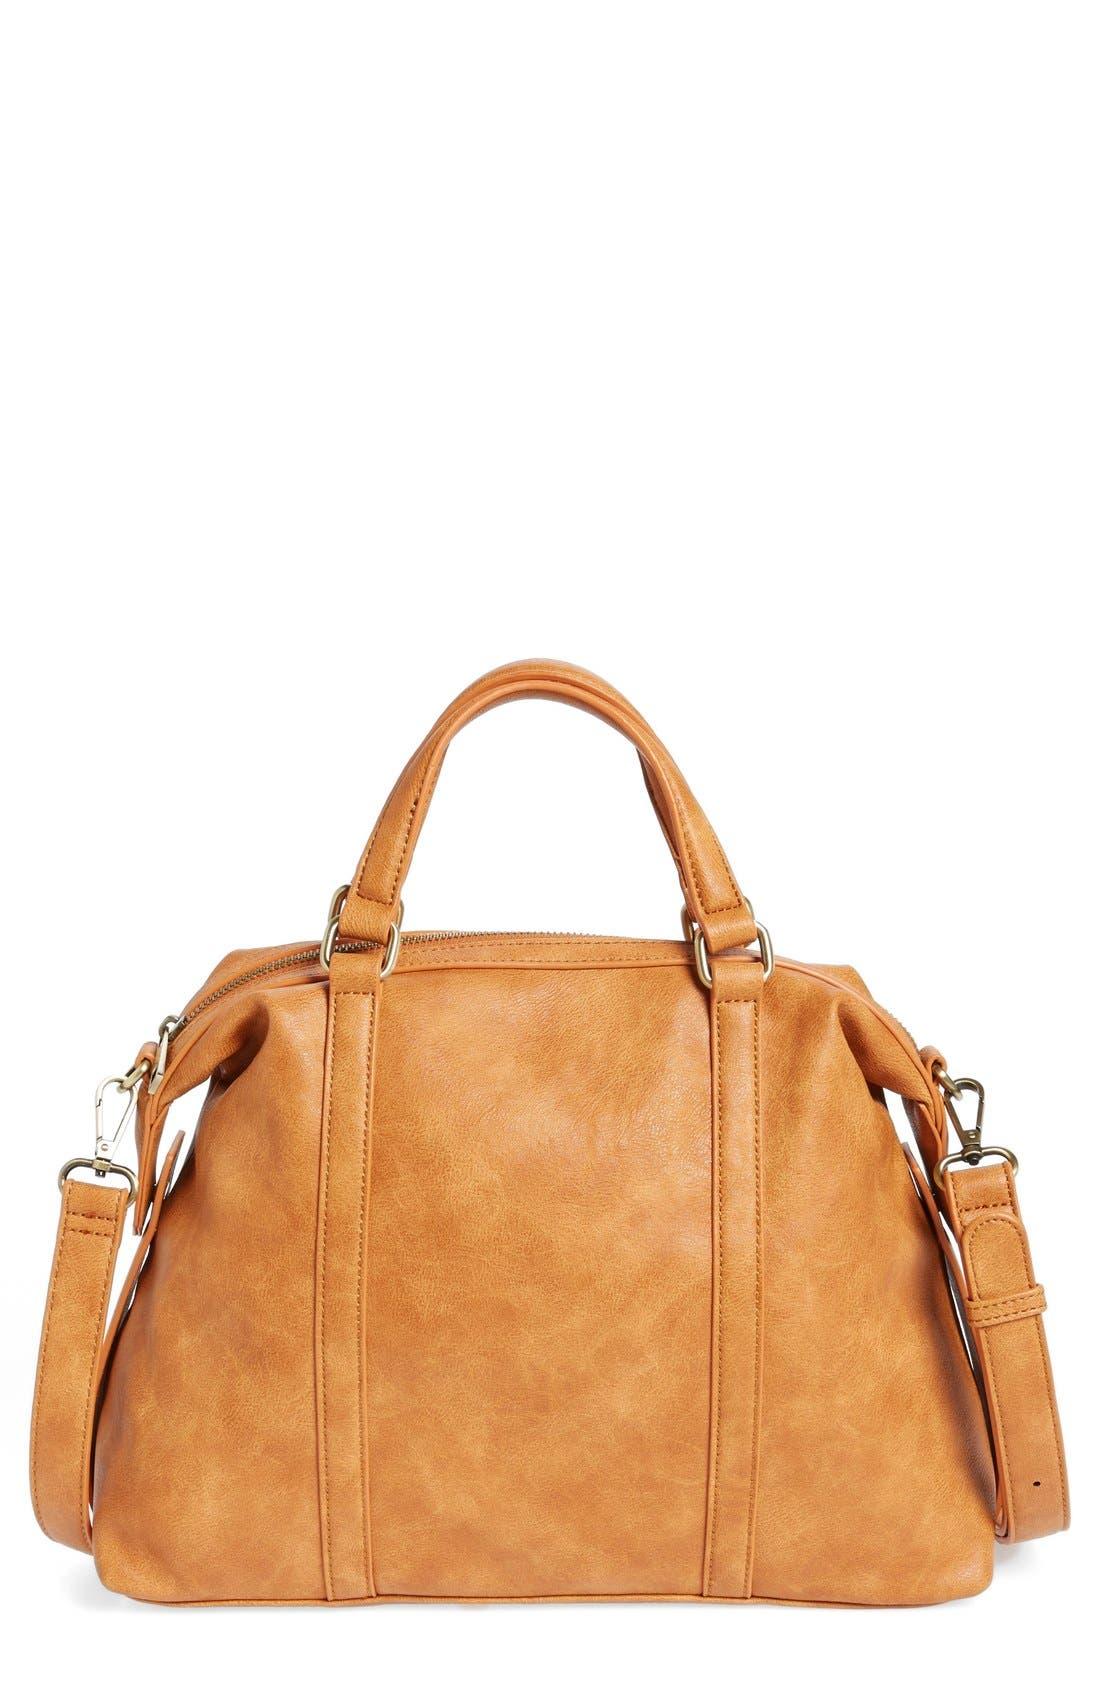 'Oliva' Faux Leather Satchel,                             Main thumbnail 2, color,